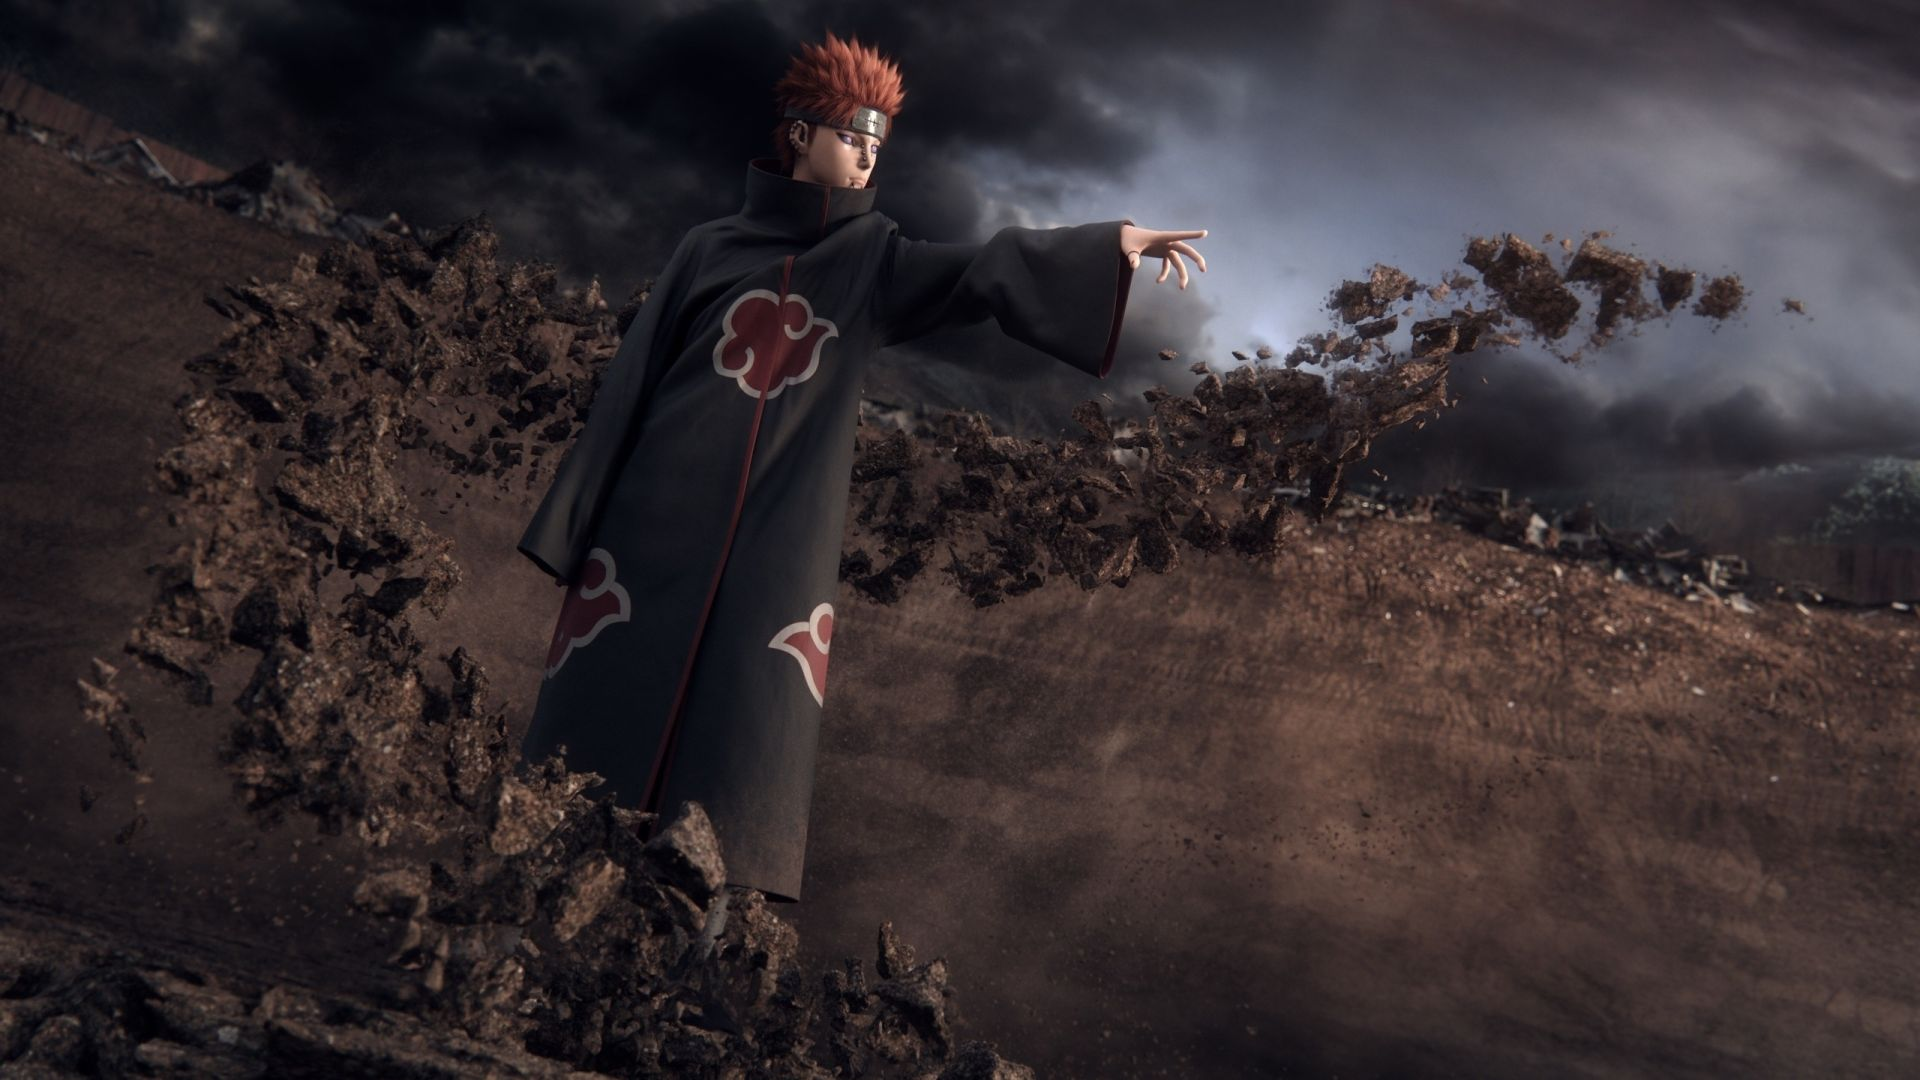 Naruto Wallpaper hd, Best Wallpaper